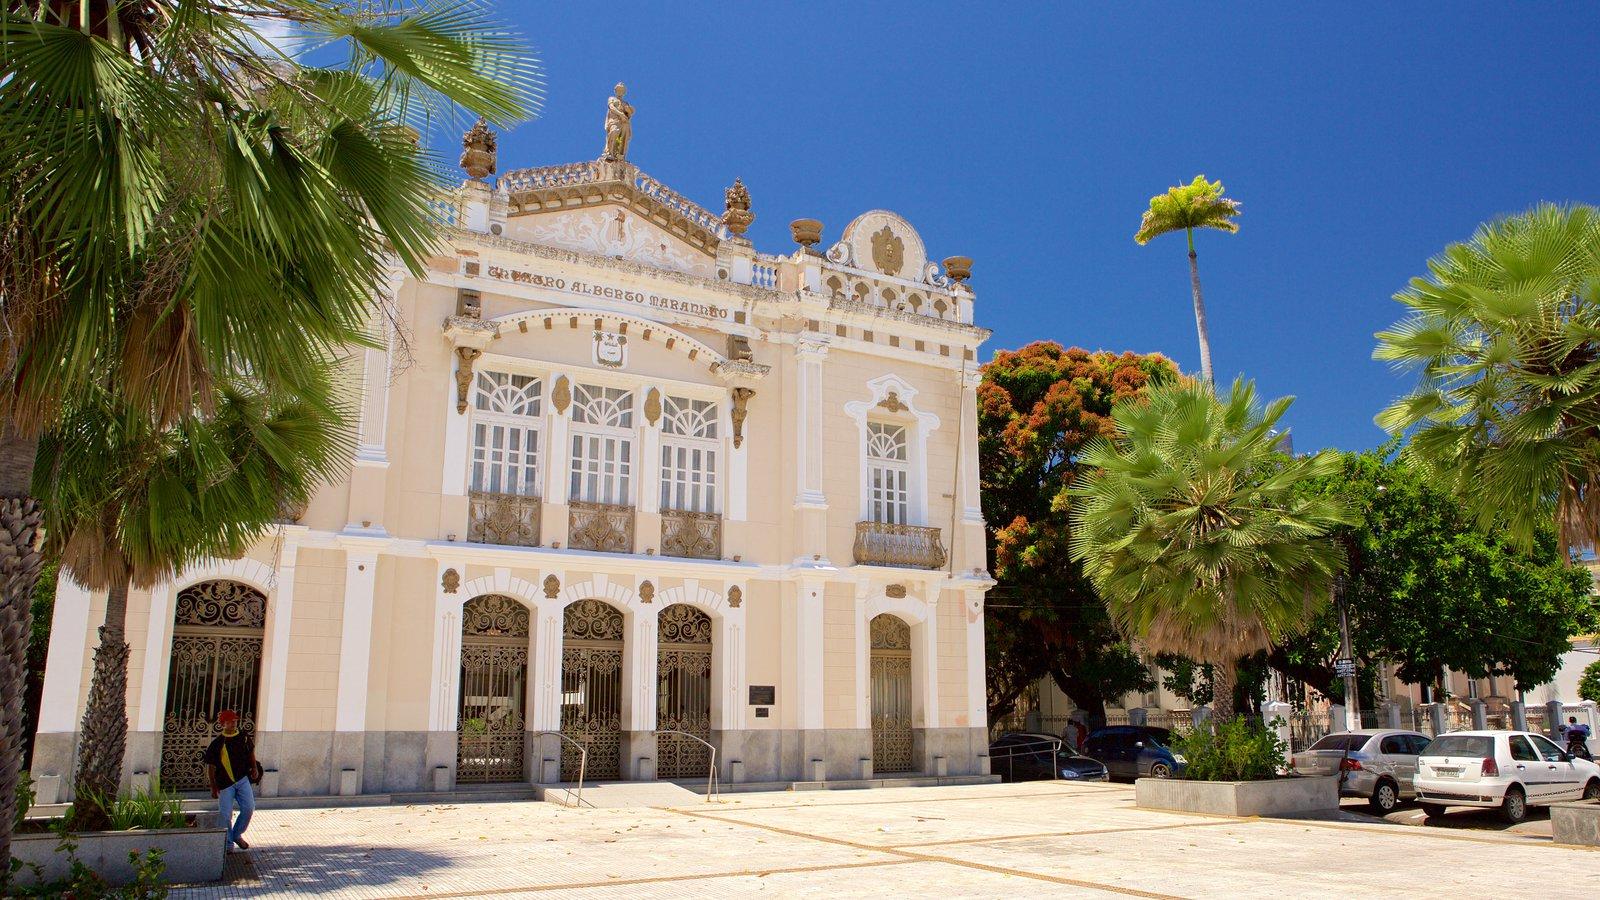 Teatro Alberto Maranhão caracterizando cenas de teatro e elementos de patrimônio